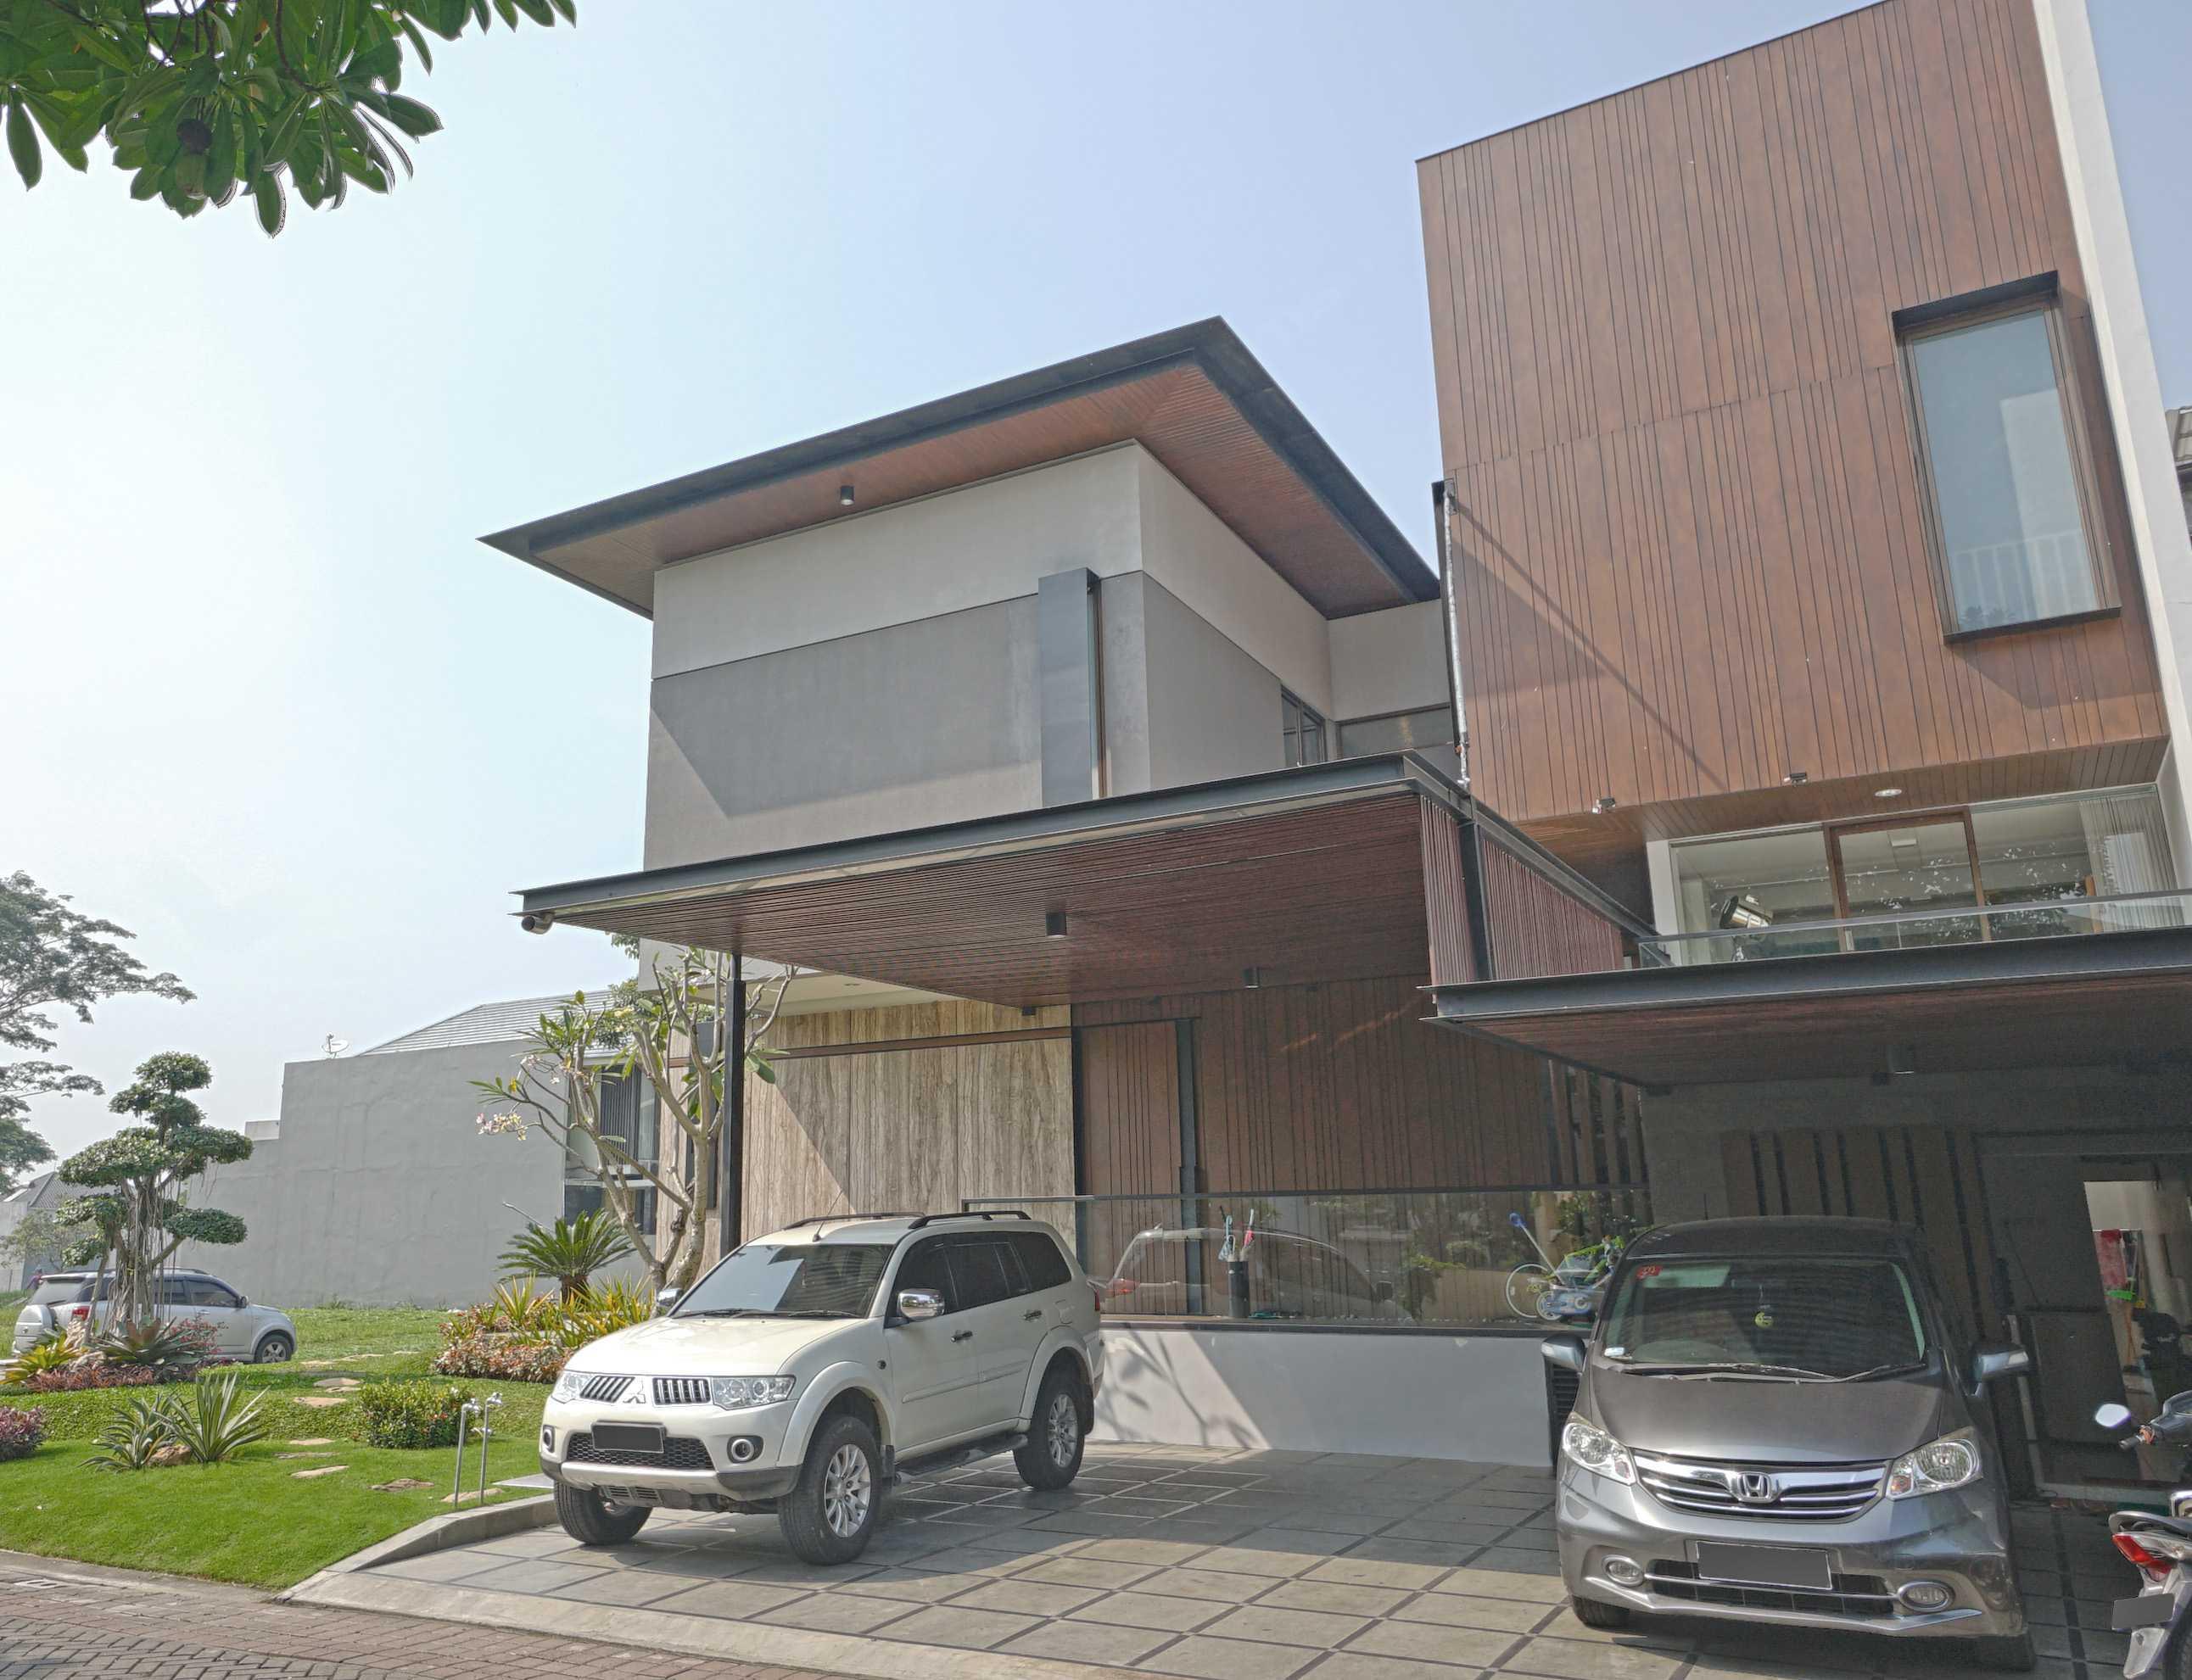 Rendic Ho Dw House Surabaya, Kota Sby, Jawa Timur, Indonesia Surabaya, Kota Sby, Jawa Timur, Indonesia Rendic-Ho-Dw-House   107062